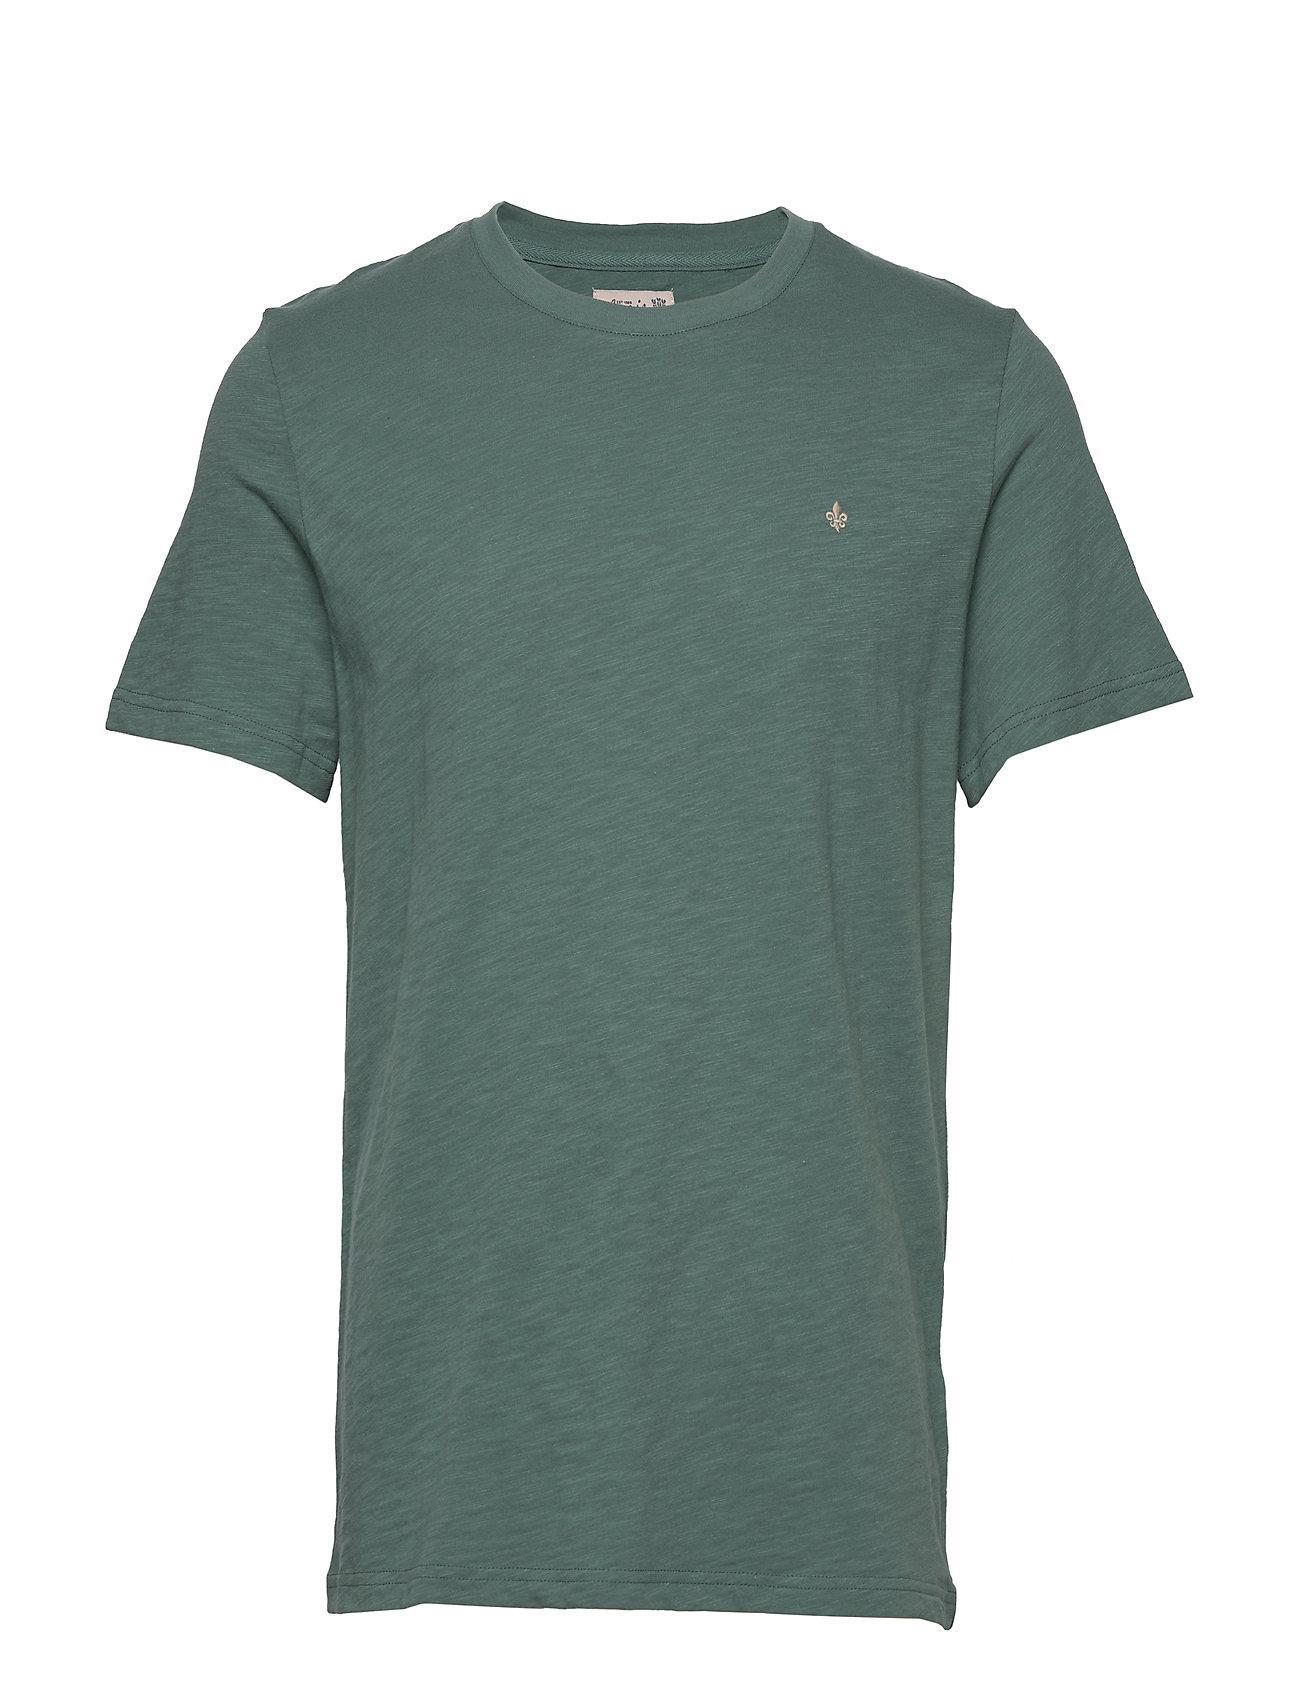 Image of Morris Tee T-shirt Grøn Morris (3421208605)